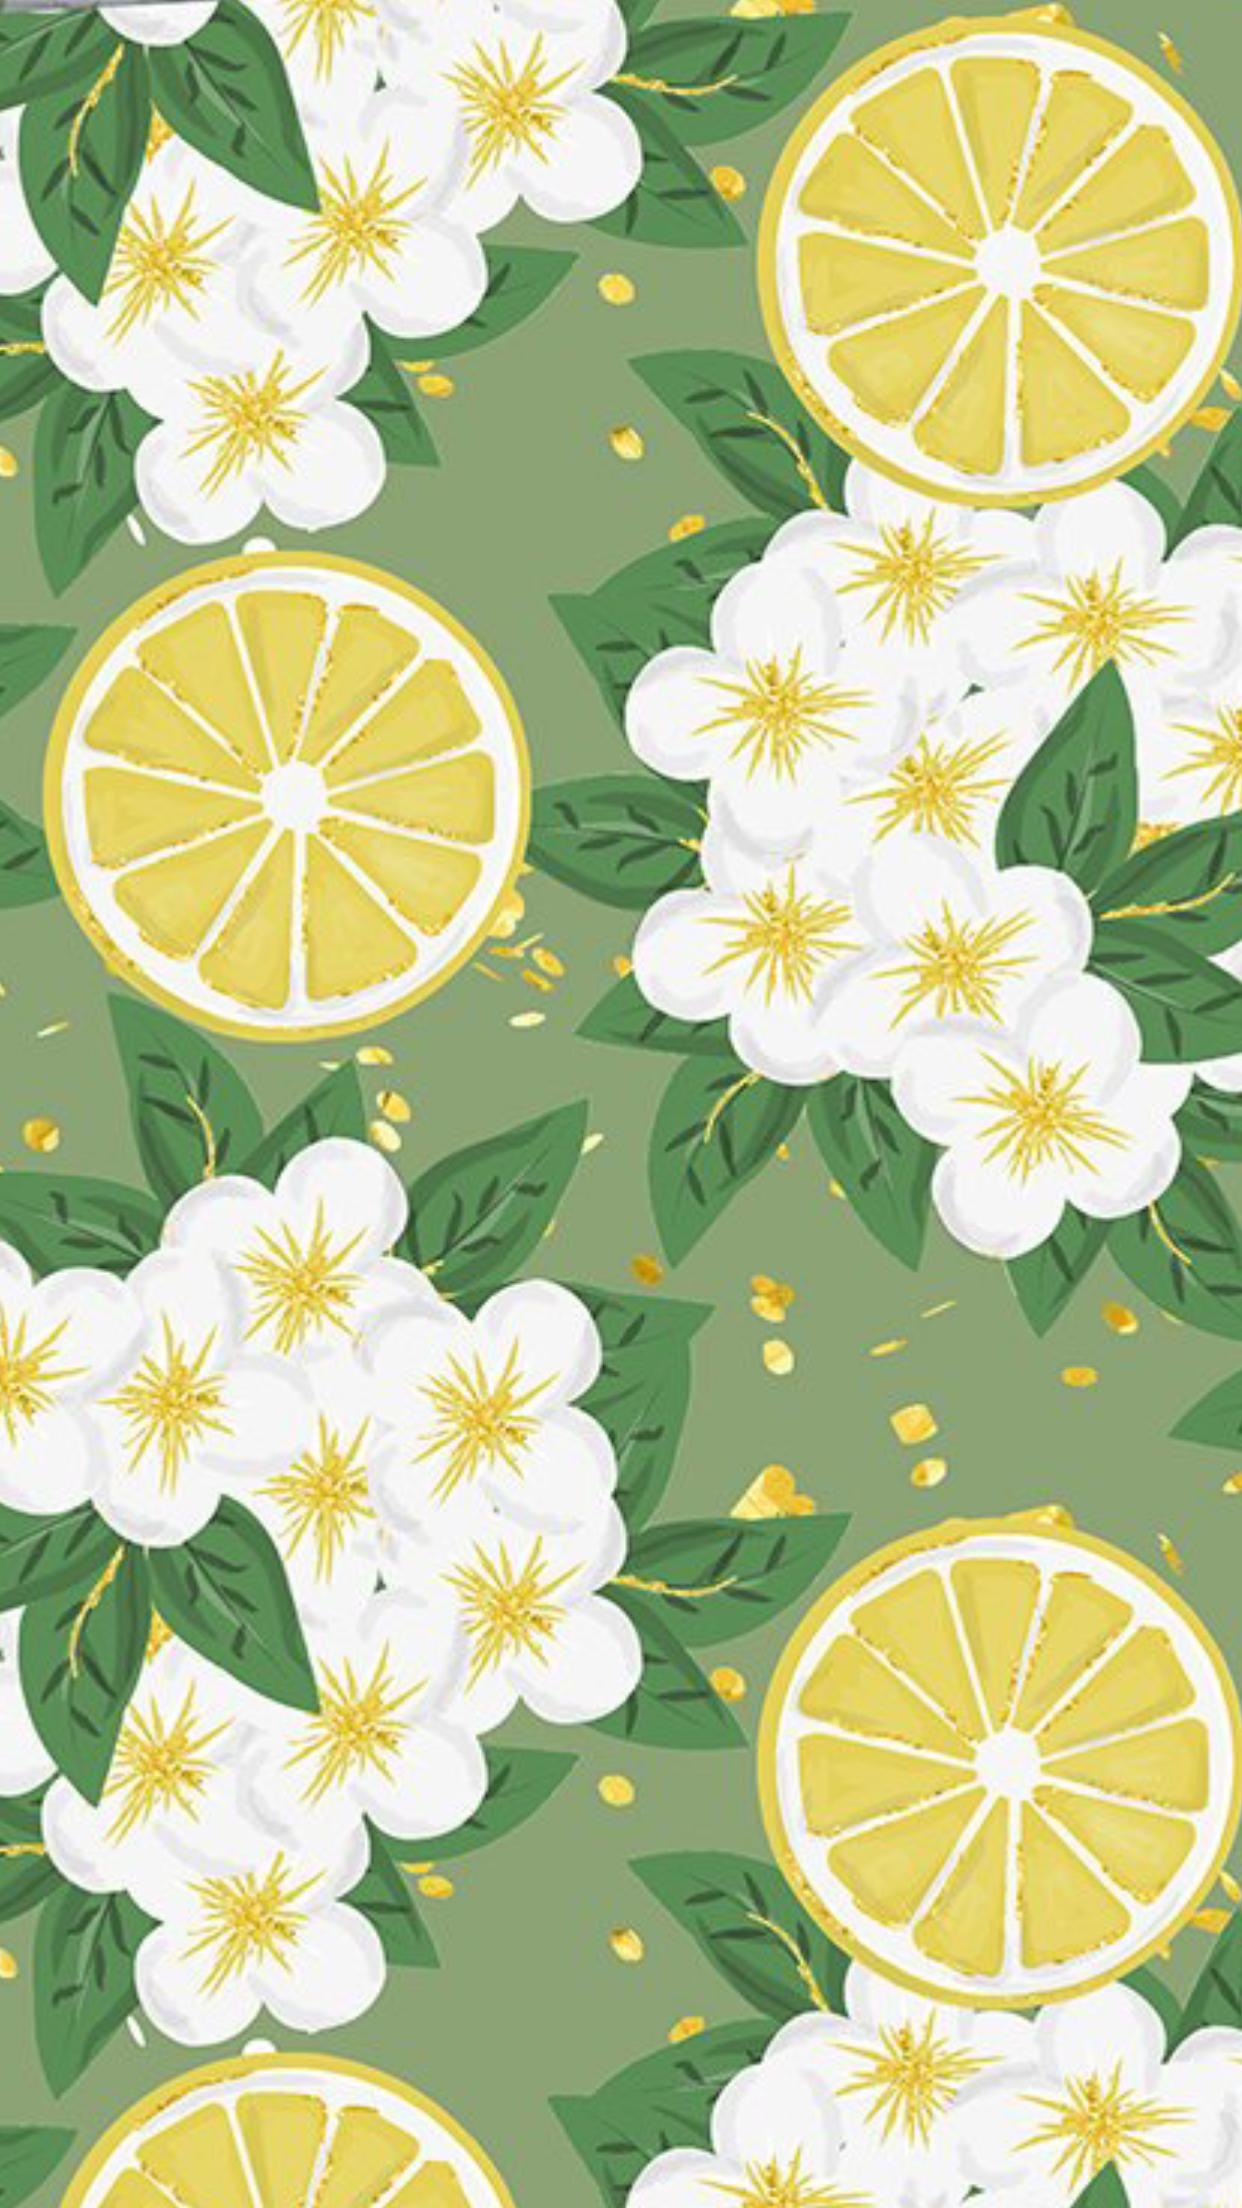 Summer dreams patterns wallpapers Fruit wallpaper